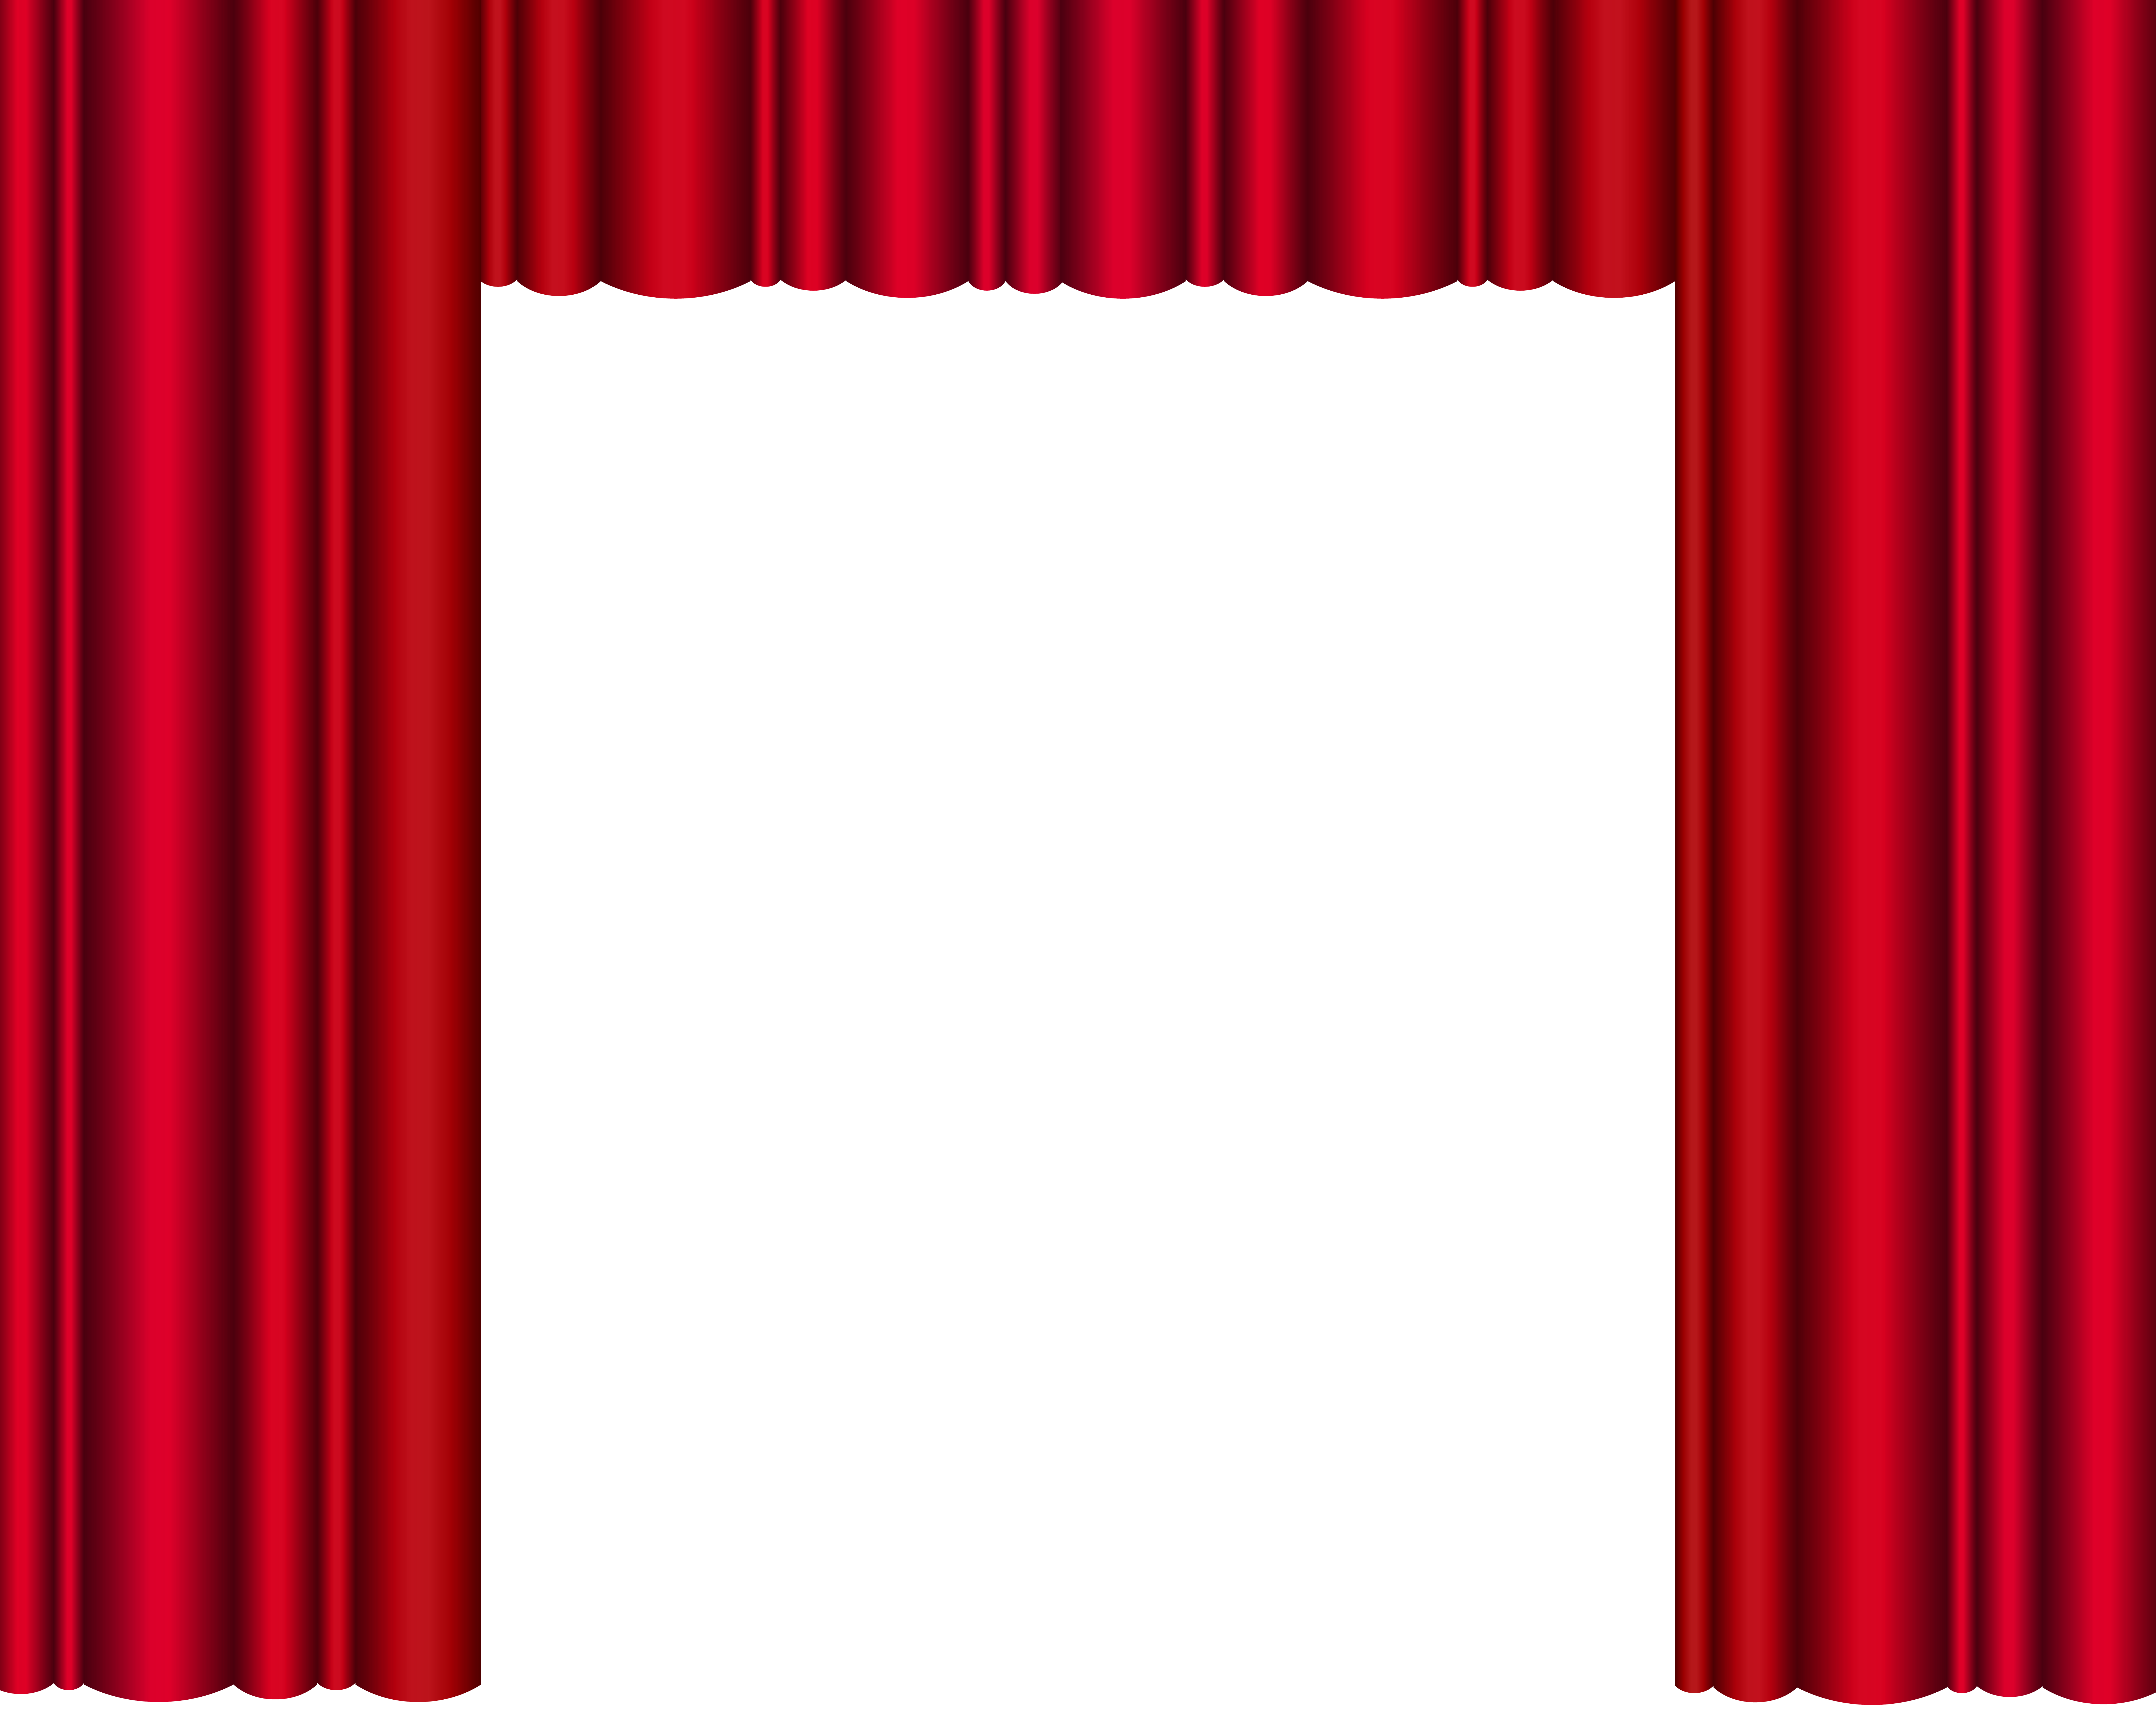 Curtain clipart transparent Clip Curtains Art Transparent High